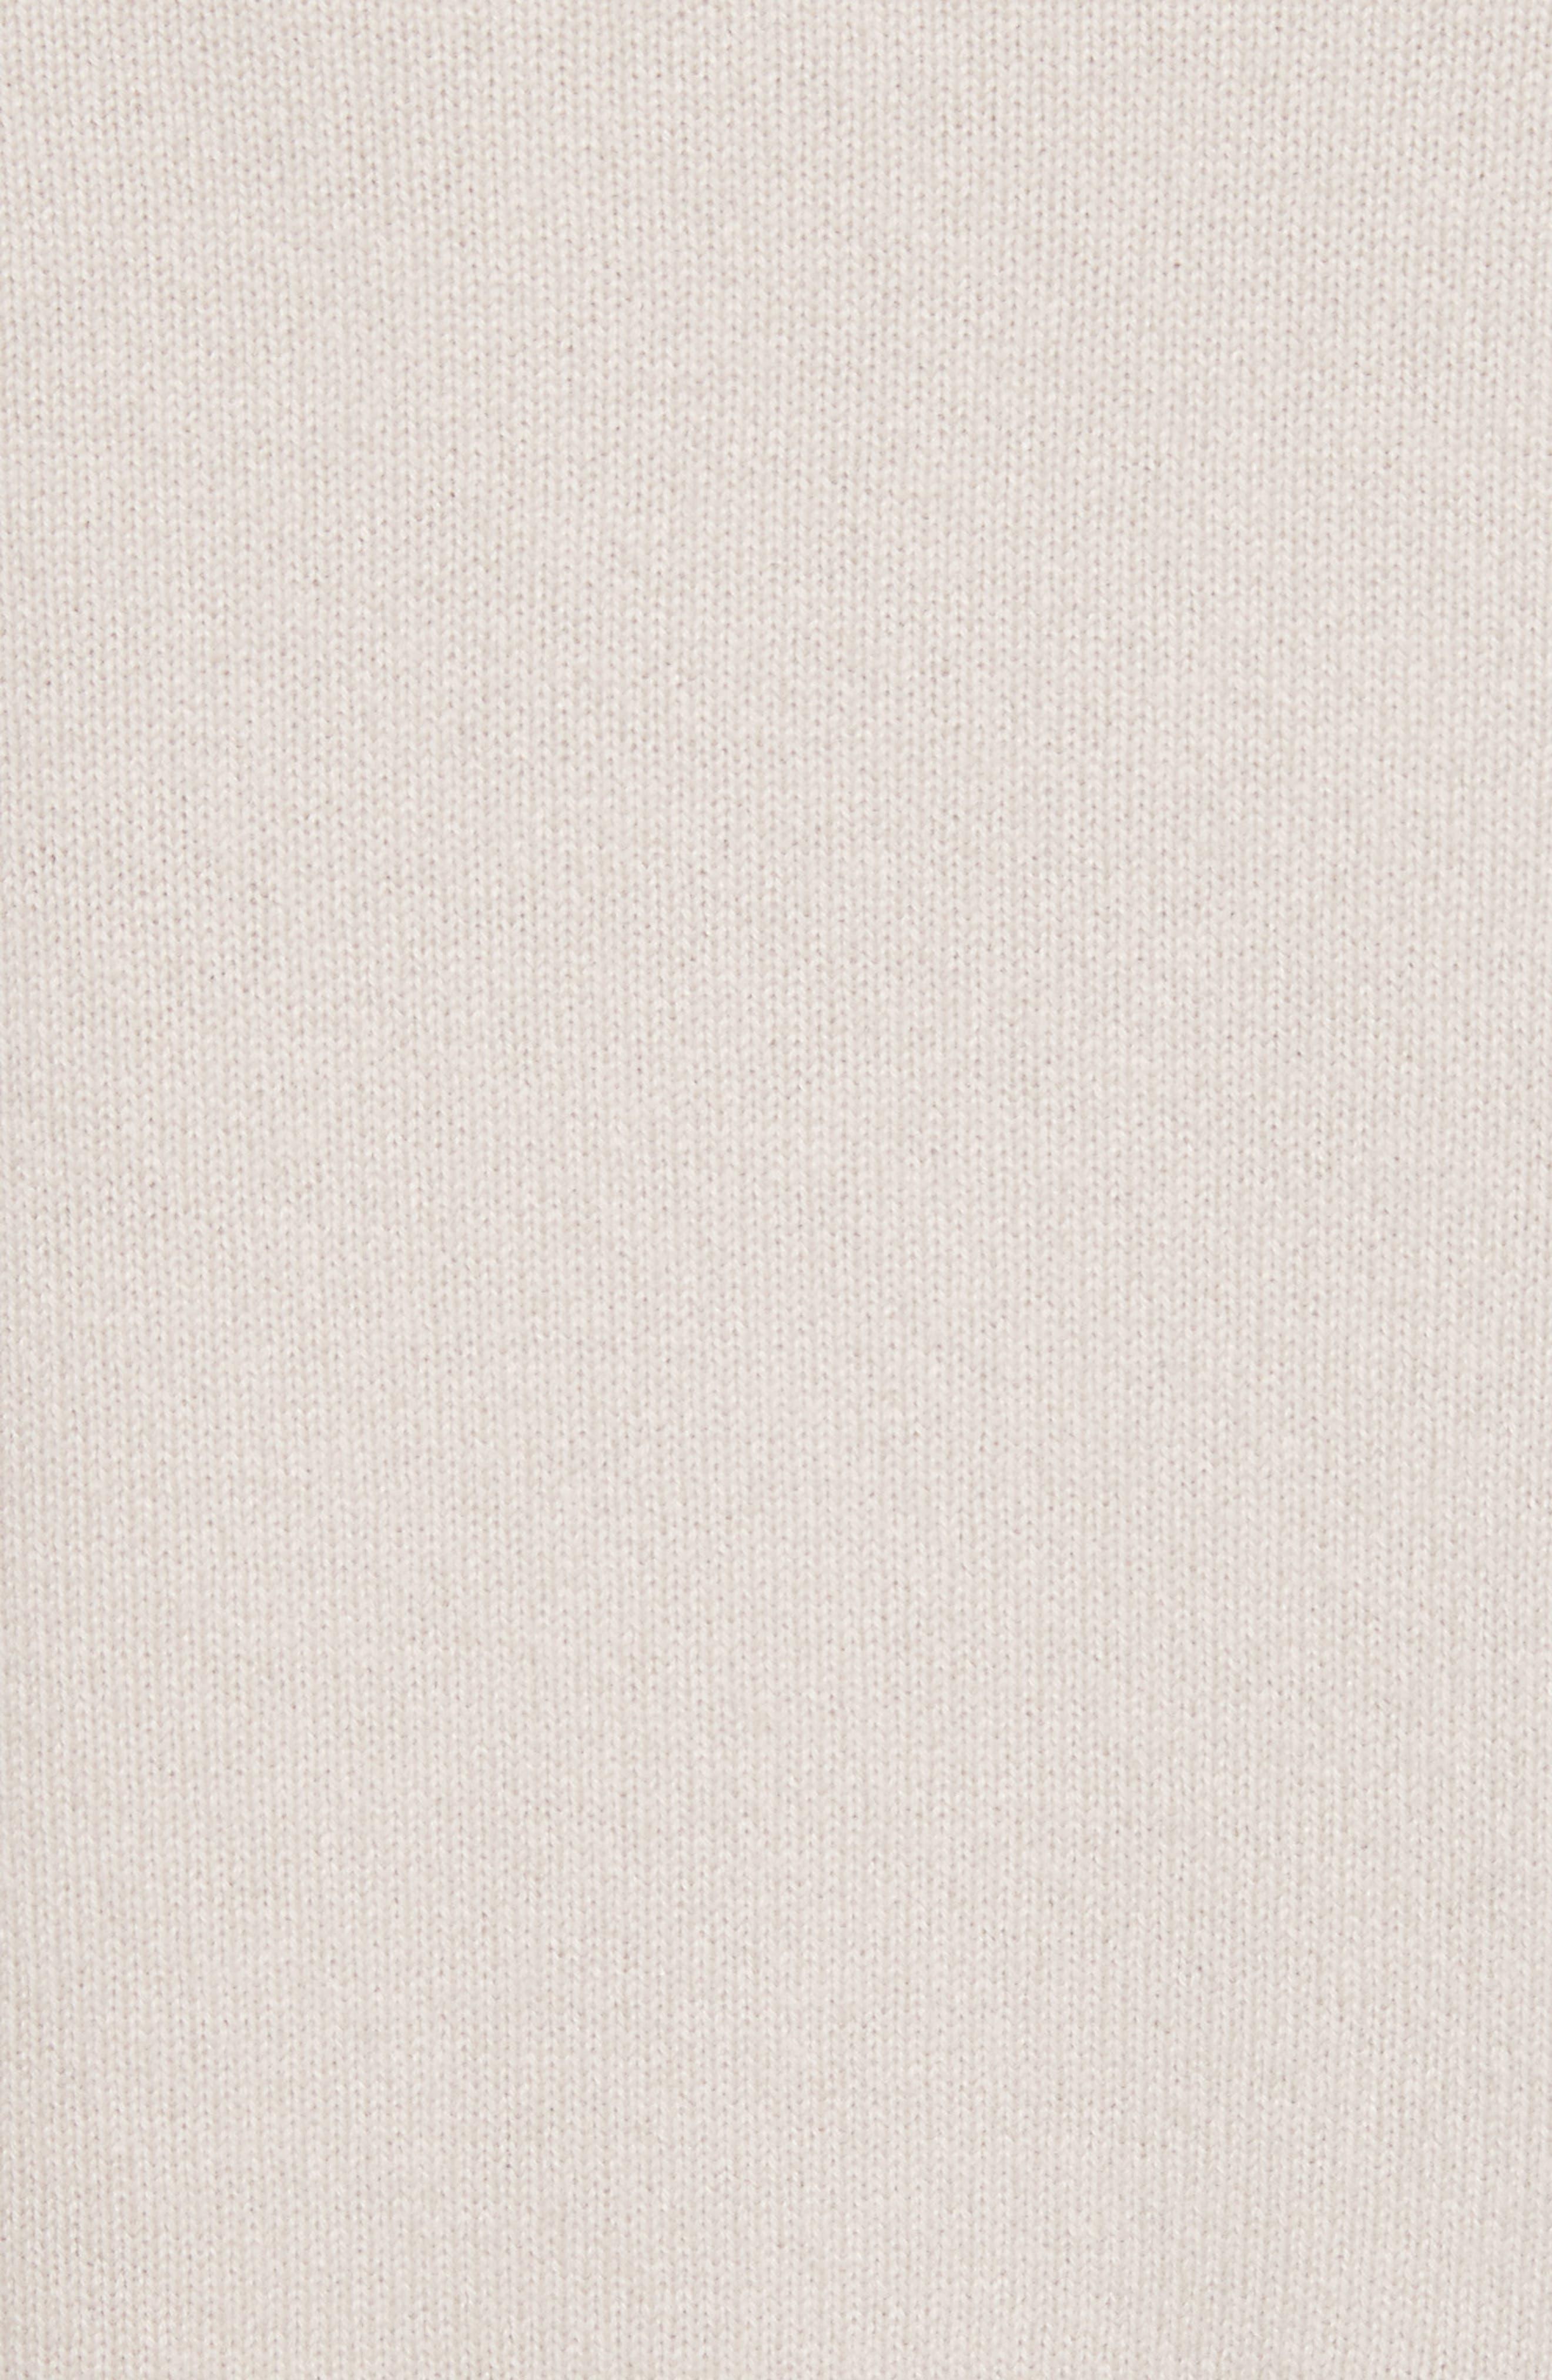 Deep V-Neck Cashmere Sweater,                             Alternate thumbnail 7, color,                             Linen